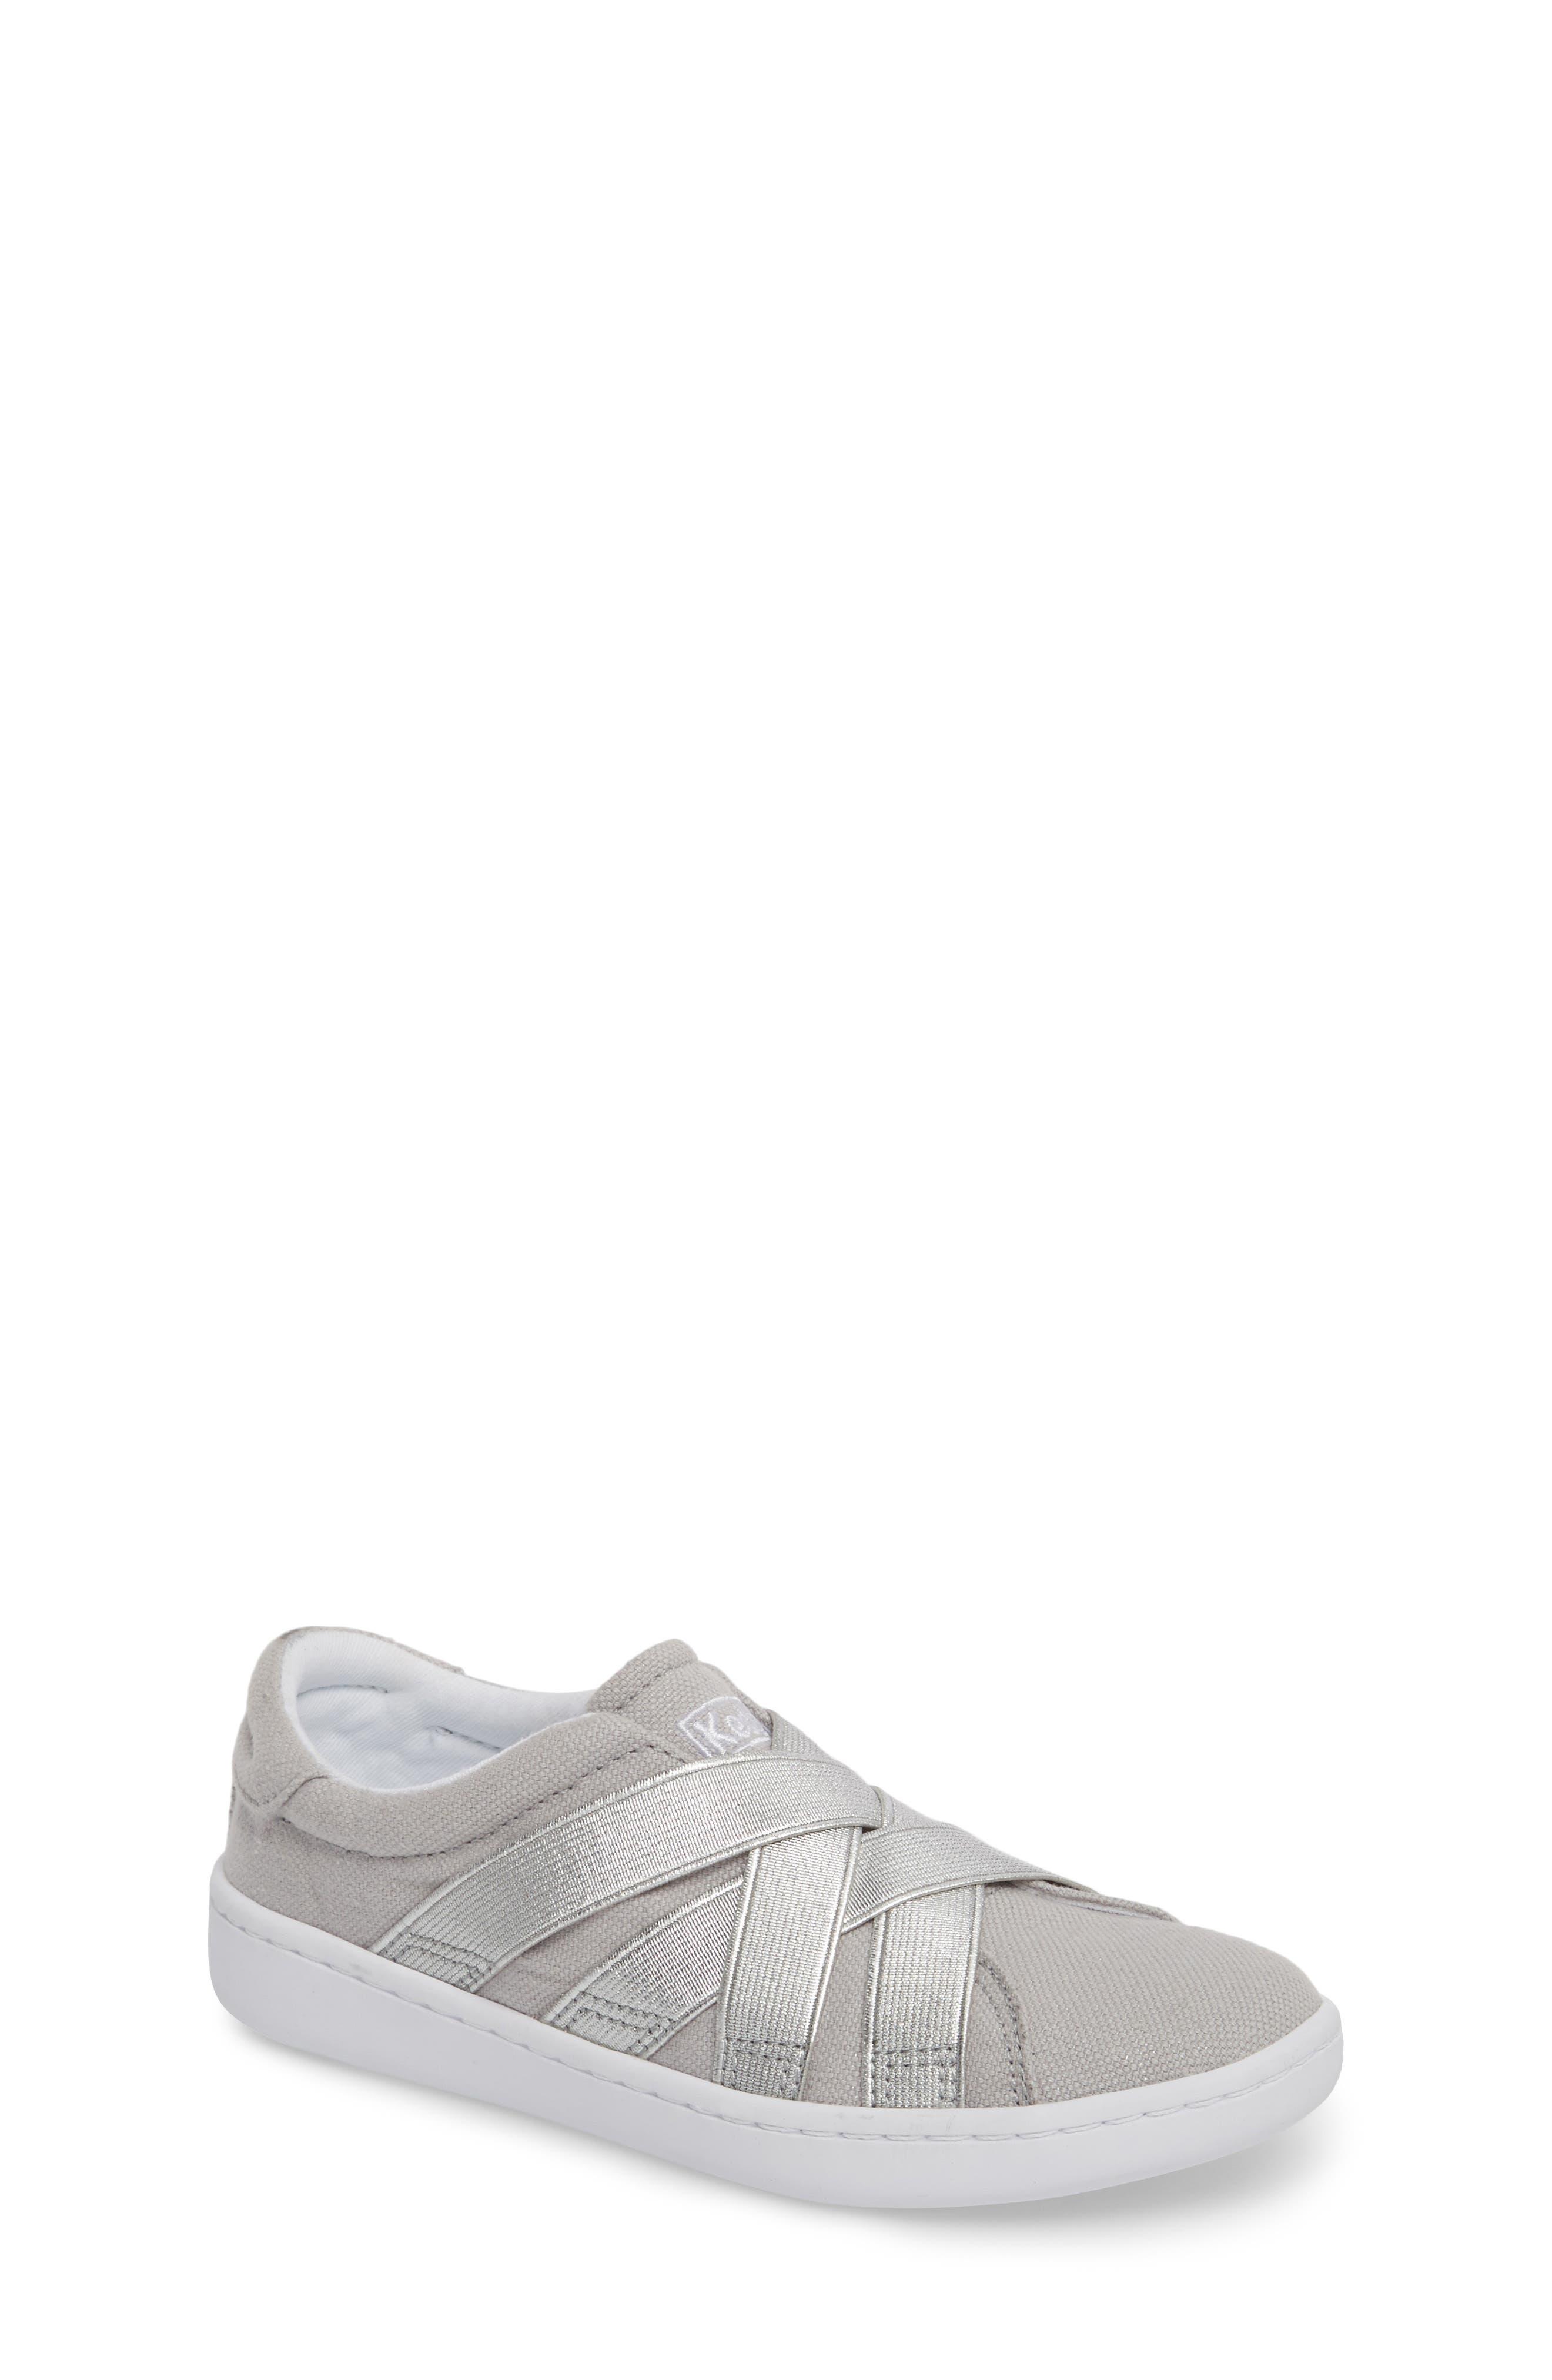 Ace Slip-on Sneaker,                             Main thumbnail 1, color,